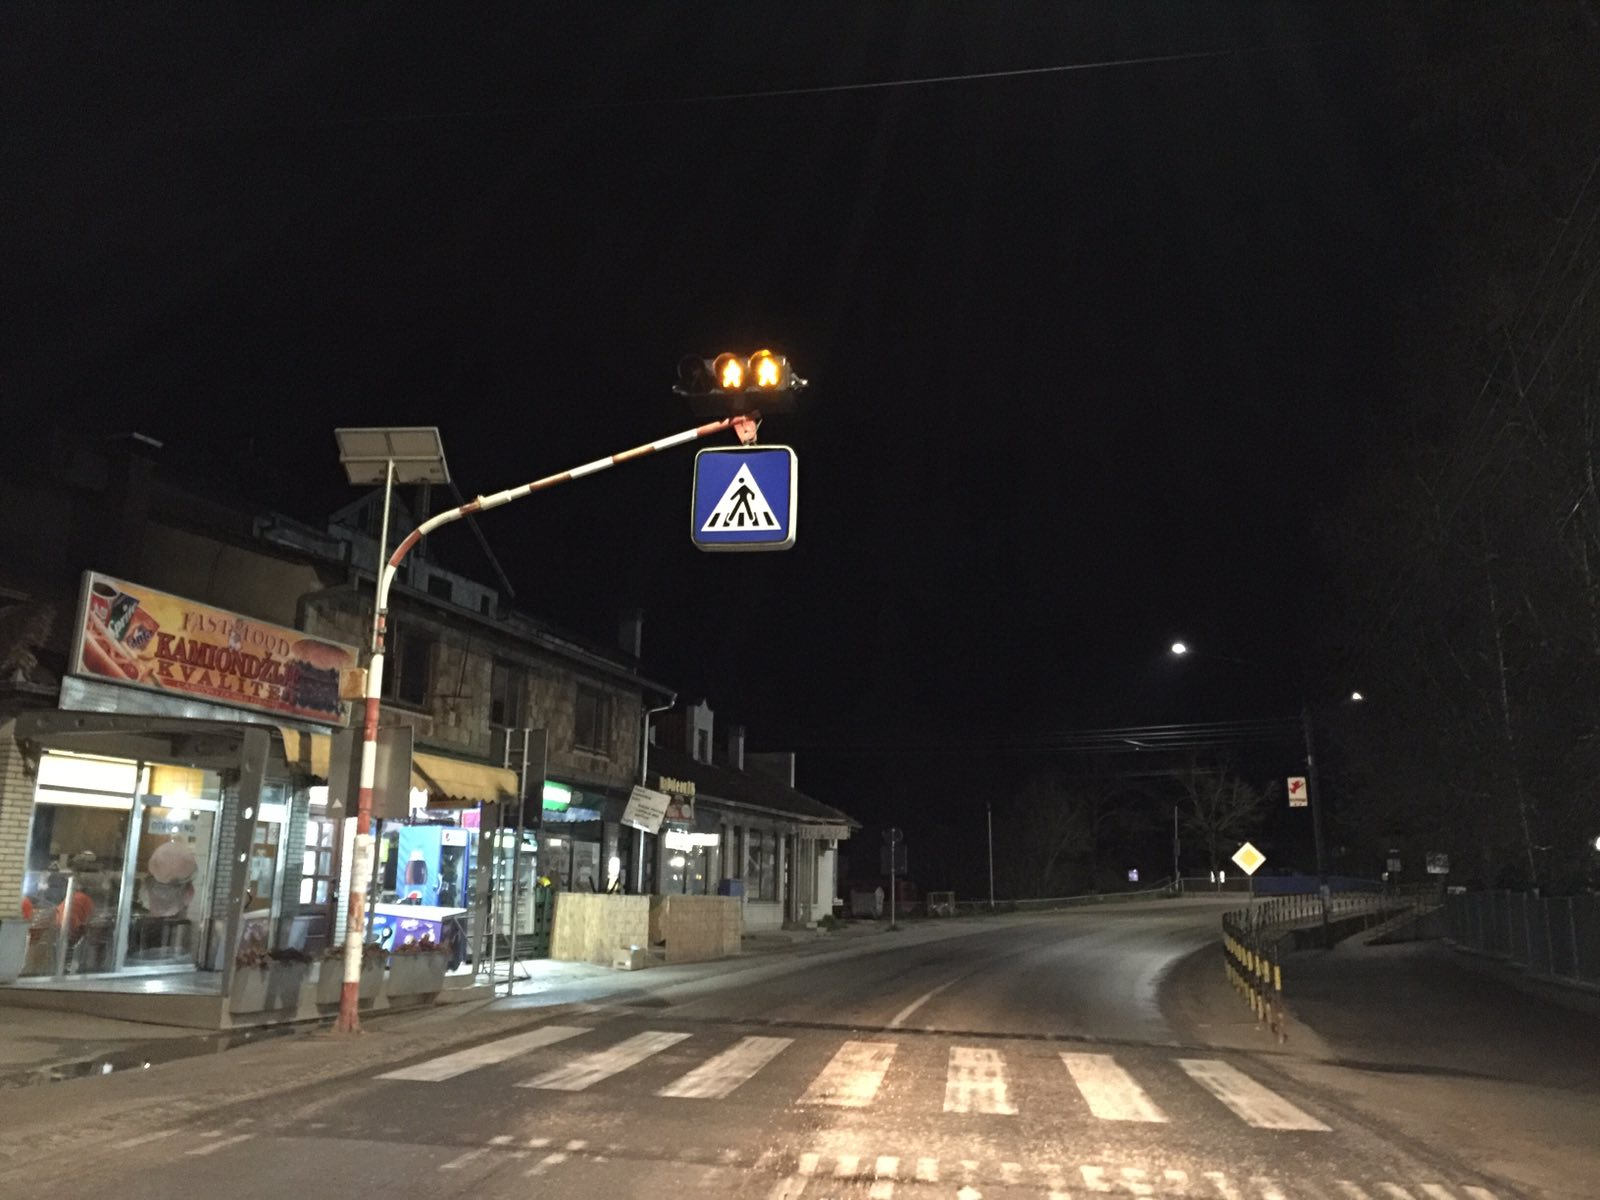 Semafori, signalizacija, foto: M.A.